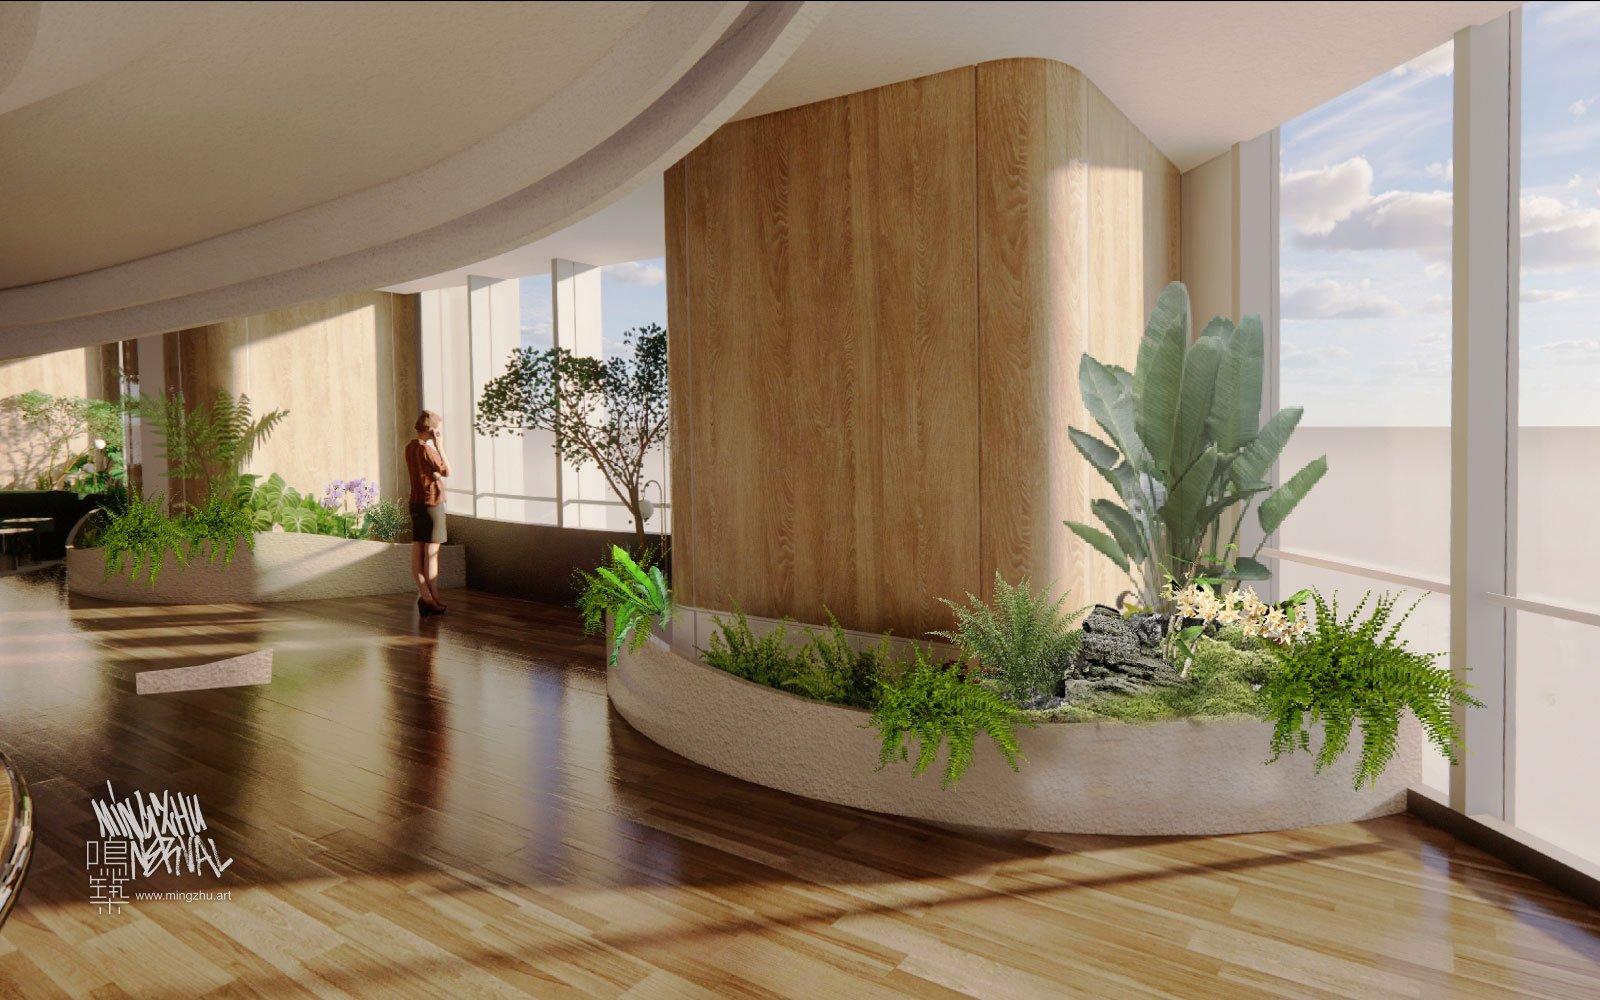 Mingzhu Nerval vertical living wall experts at Vanke showroom, Shanghai, 2021